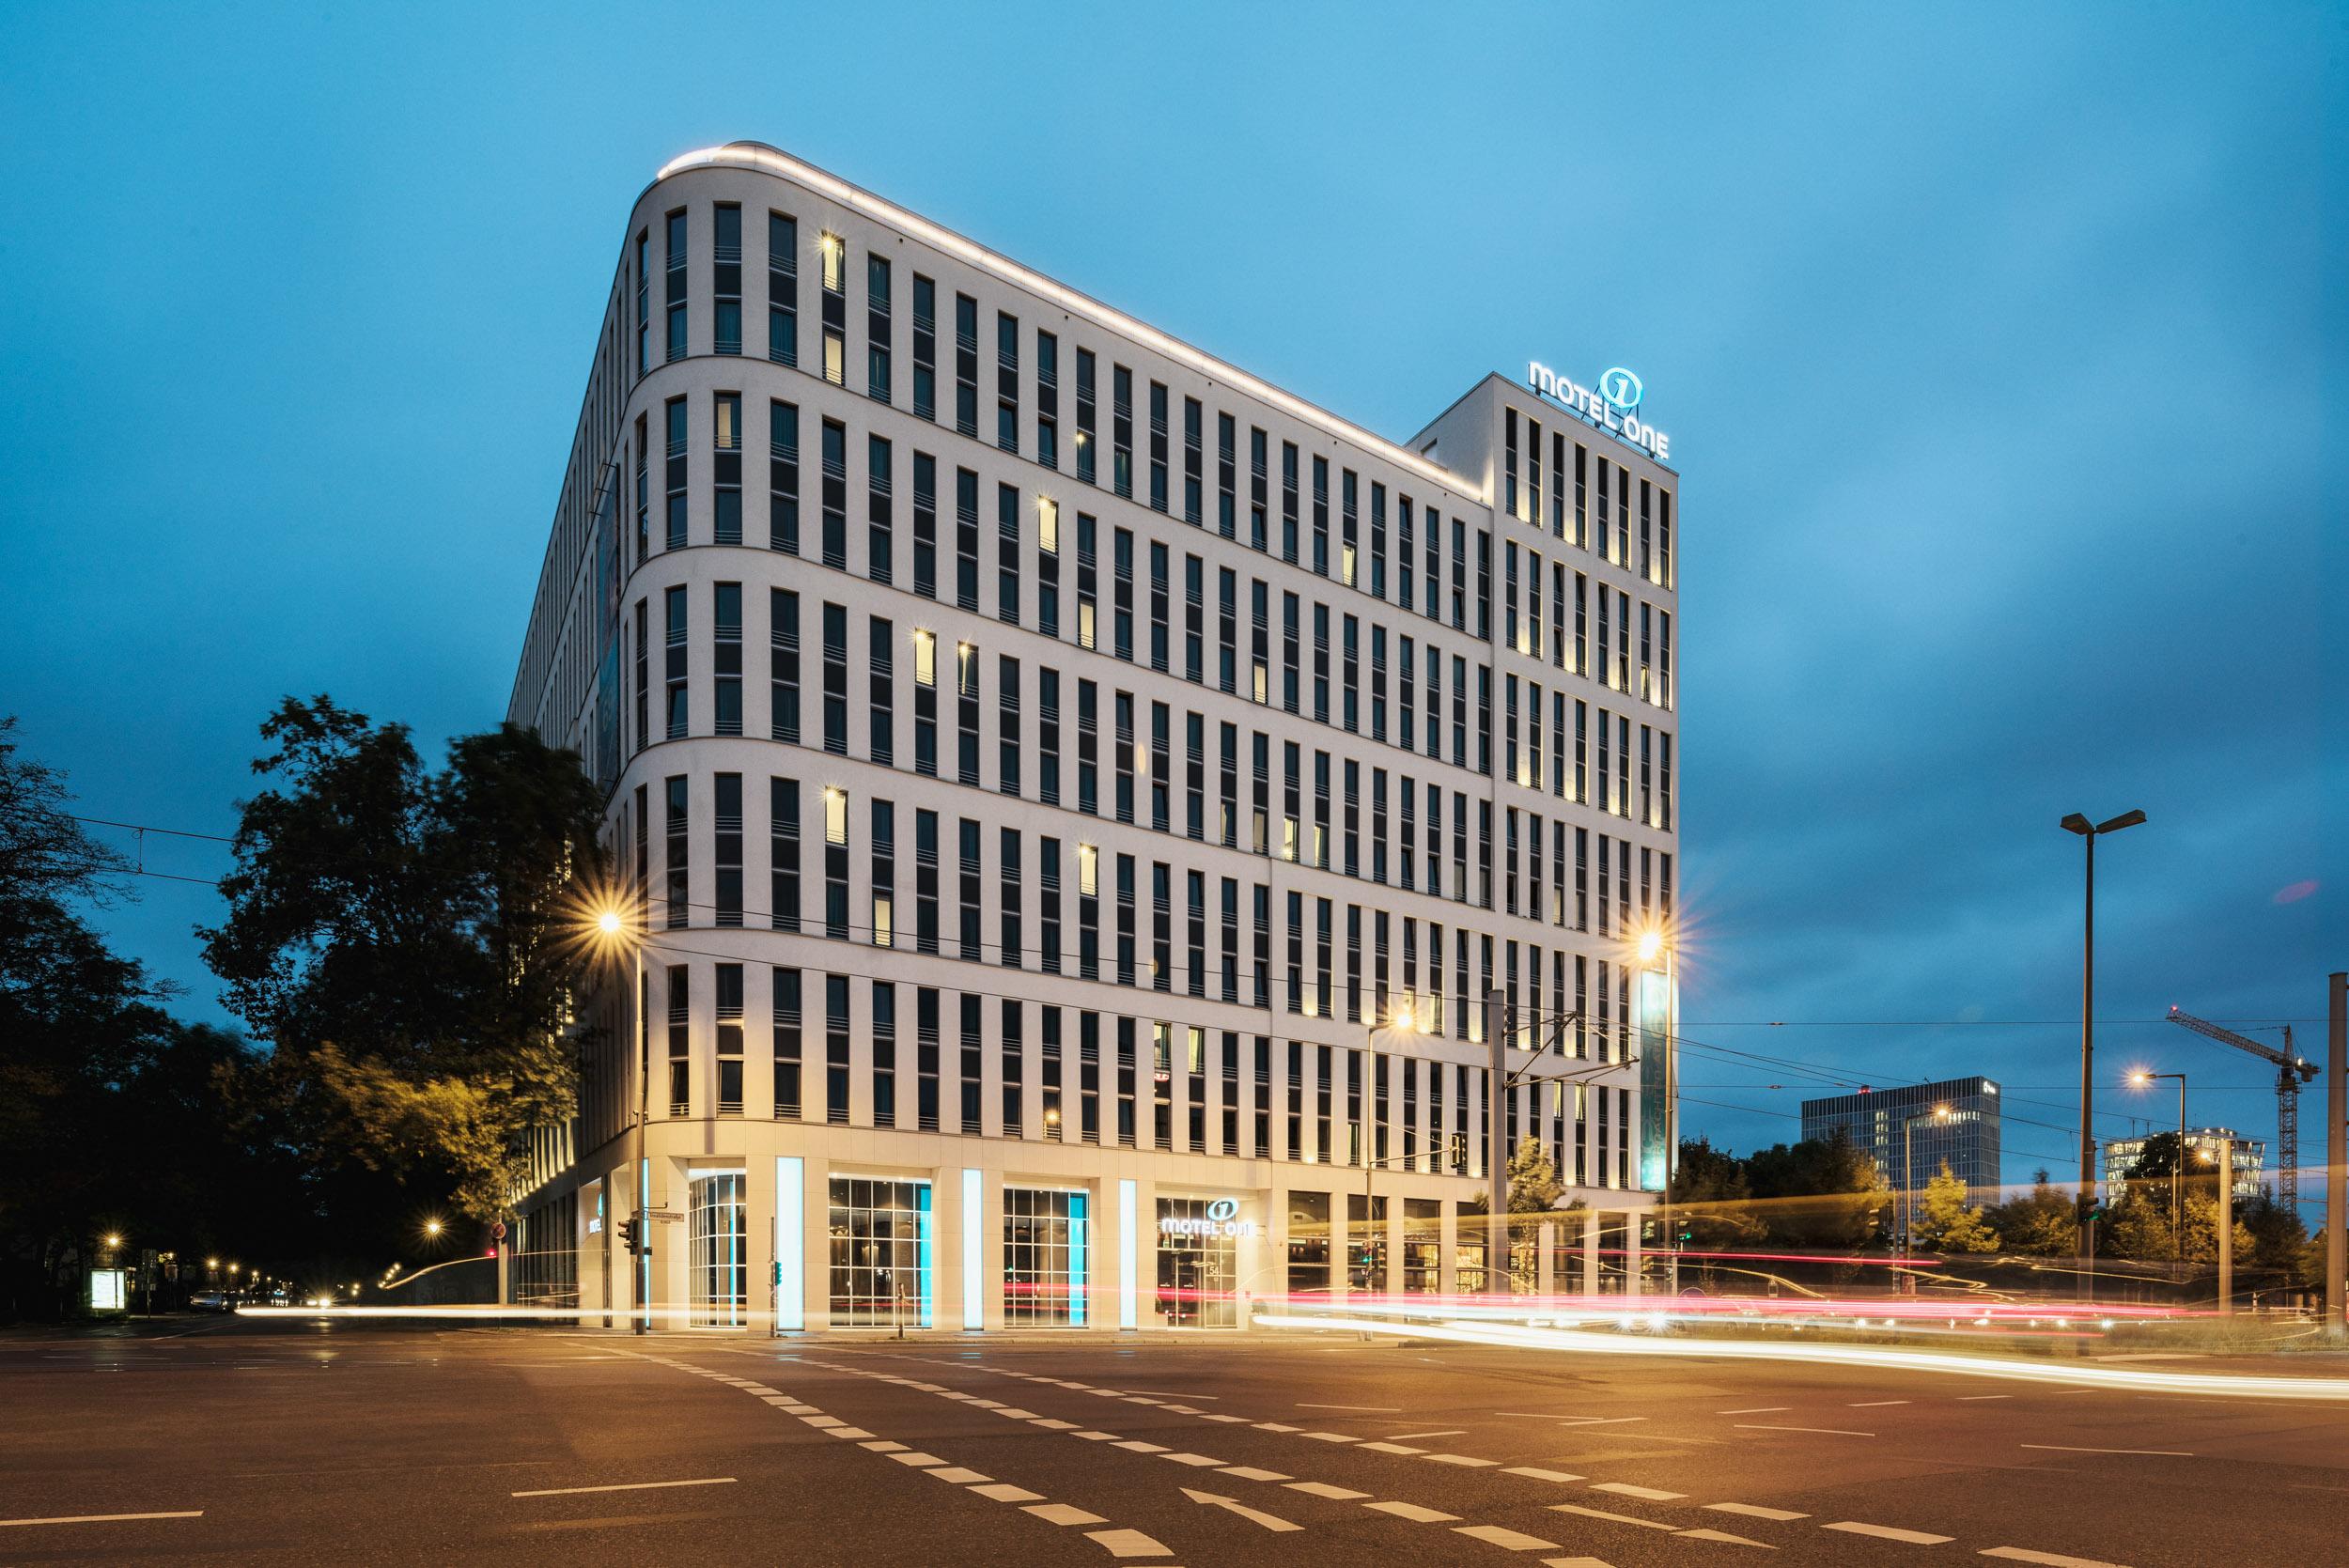 Gustav-Epple-Bauunternehmung-Motel-One-Berlin-HBF-MLX6278